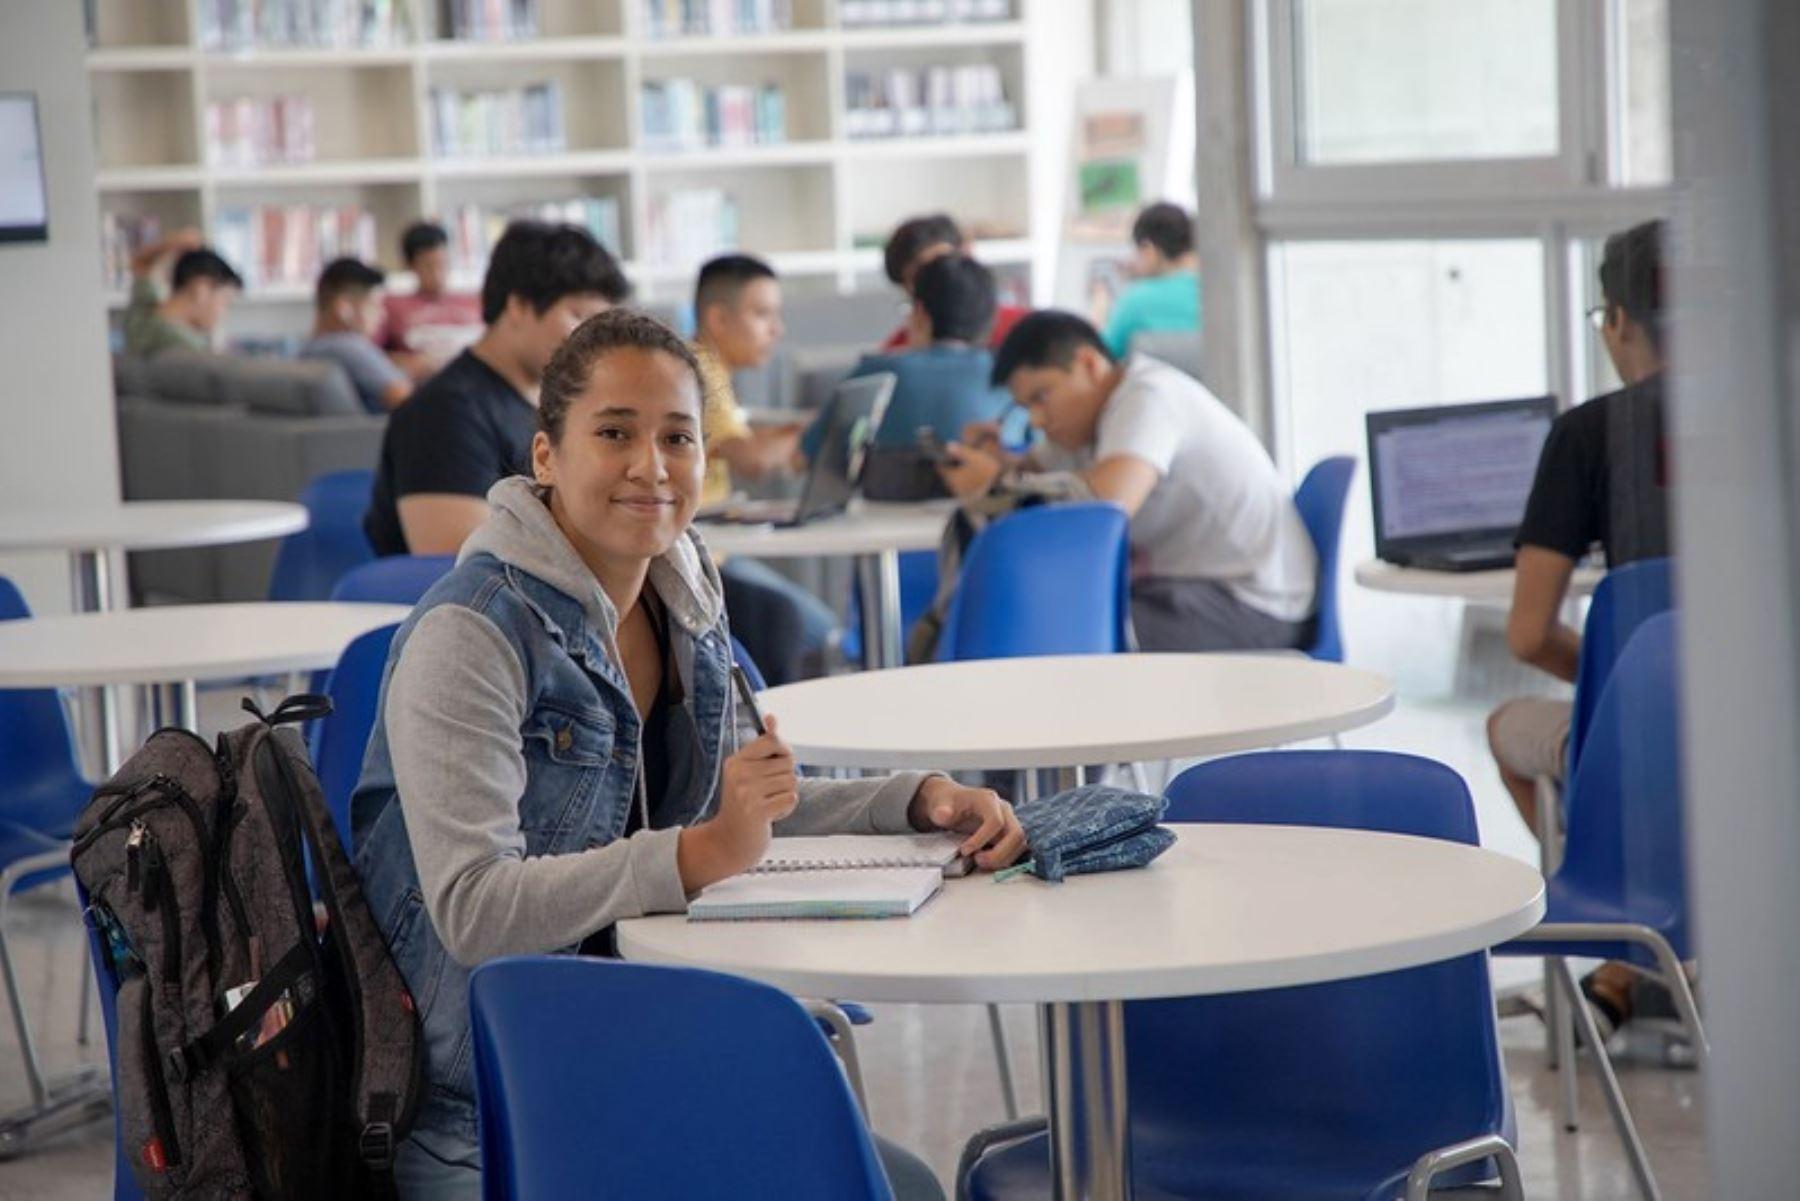 Pronabec lanza 10,000 becas para estudiantes afectados por la emergencia. Foto: ANDINA/Difusión.